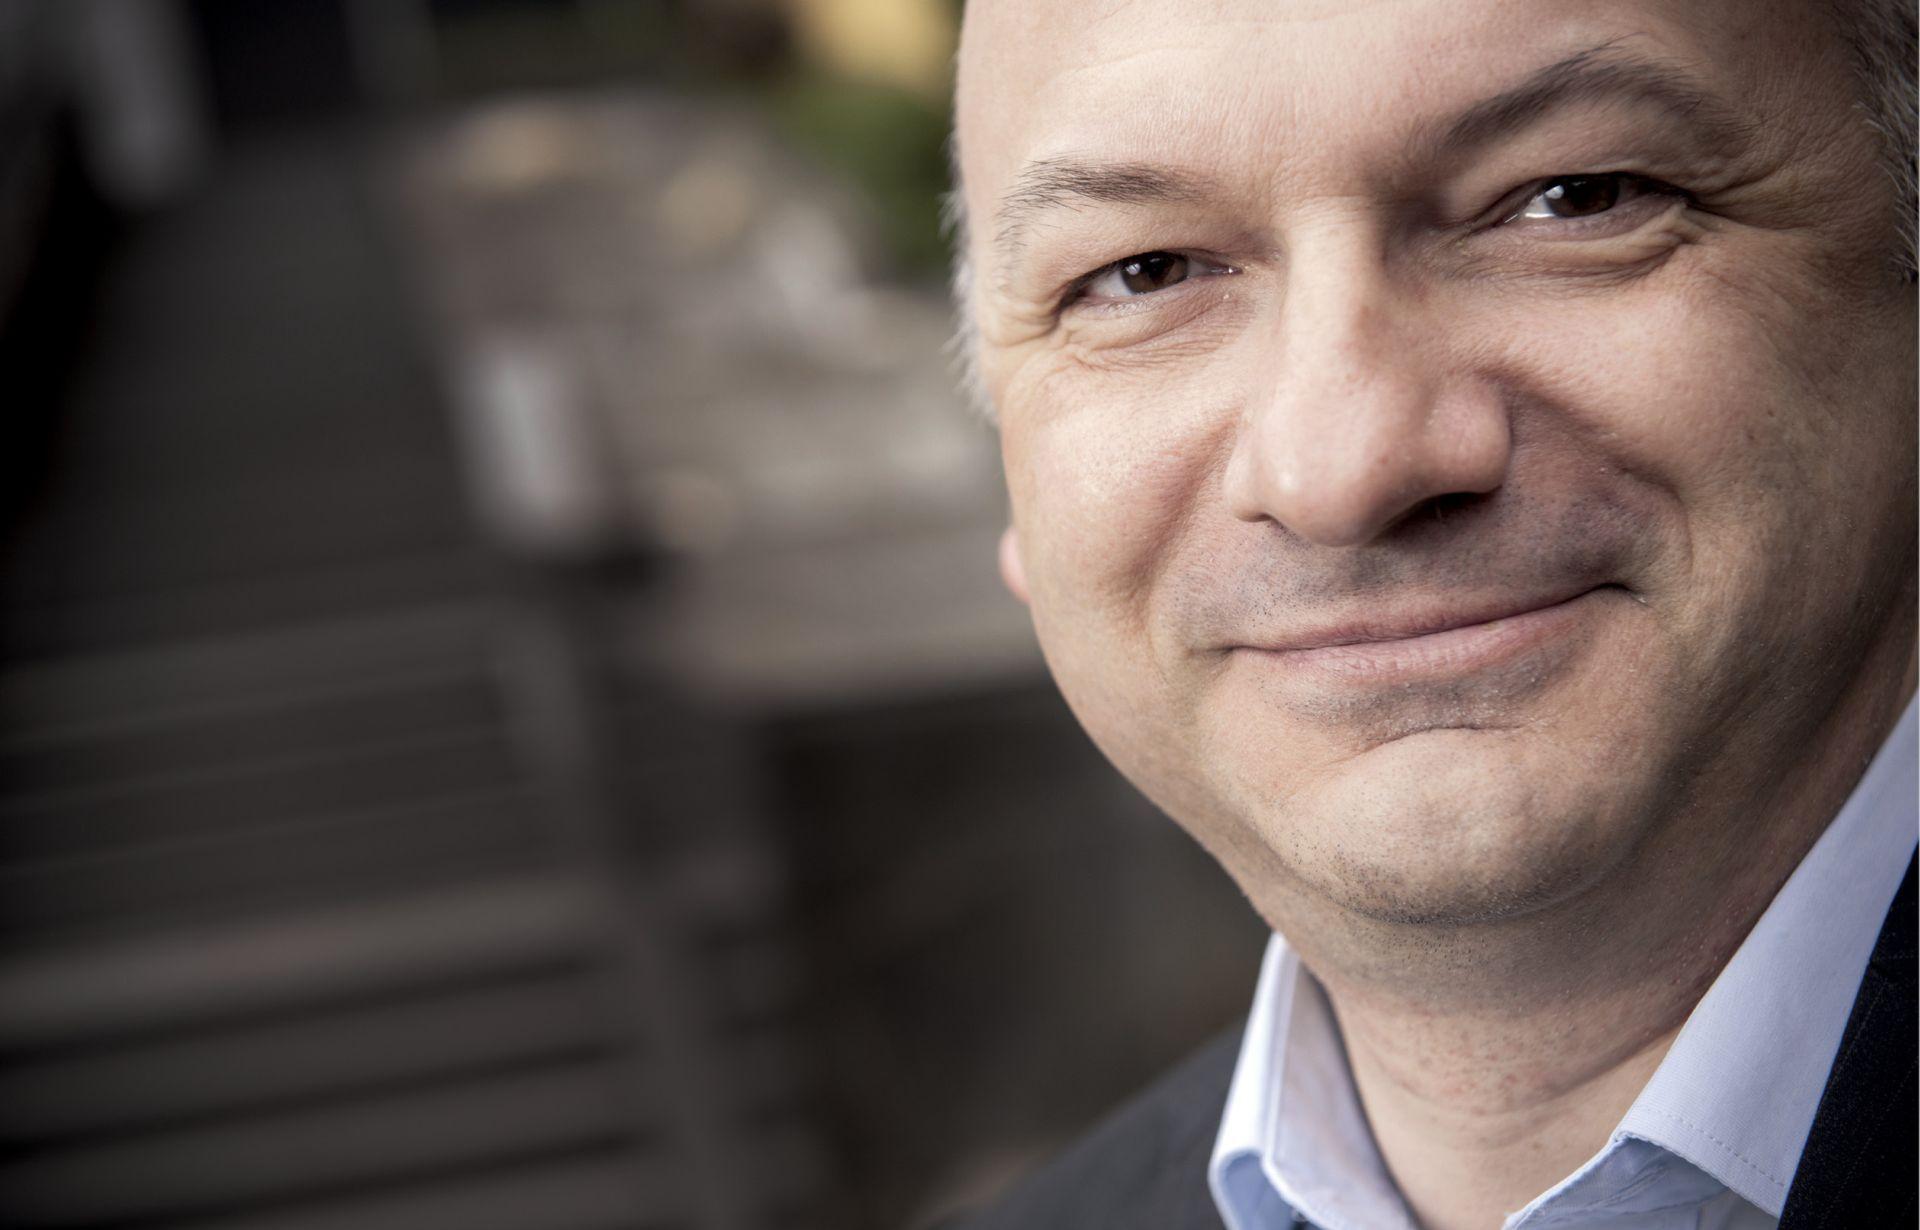 INTERVIEW: DEJAN JOVIĆ 'Redikuli s margina iz '90-ih danas su mainstream političari'